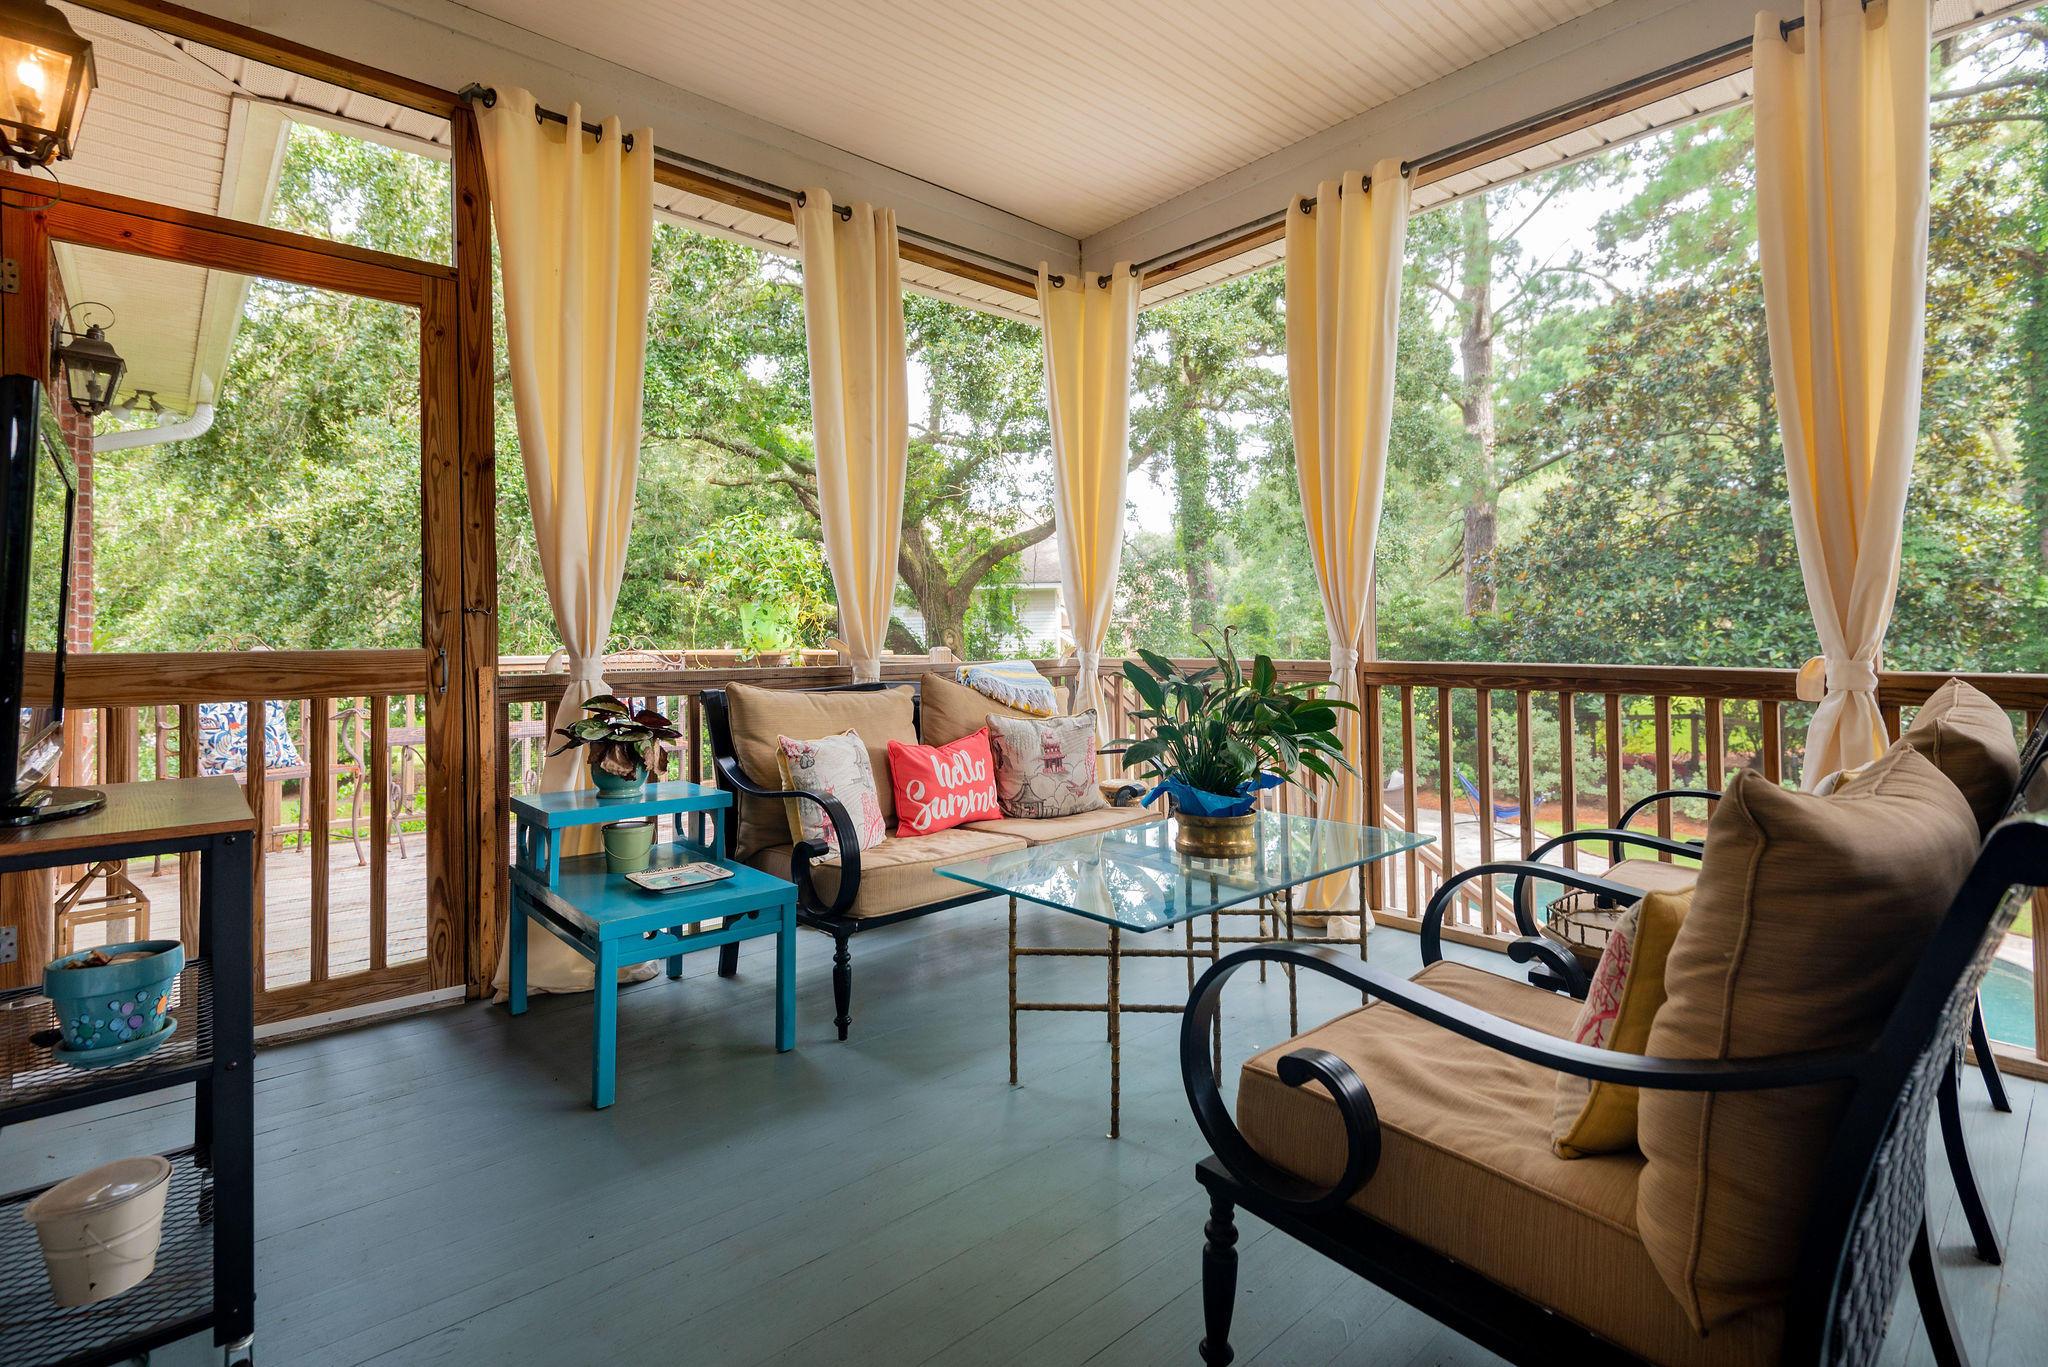 Country Club II Homes For Sale - 1482 Burningtree, Charleston, SC - 0